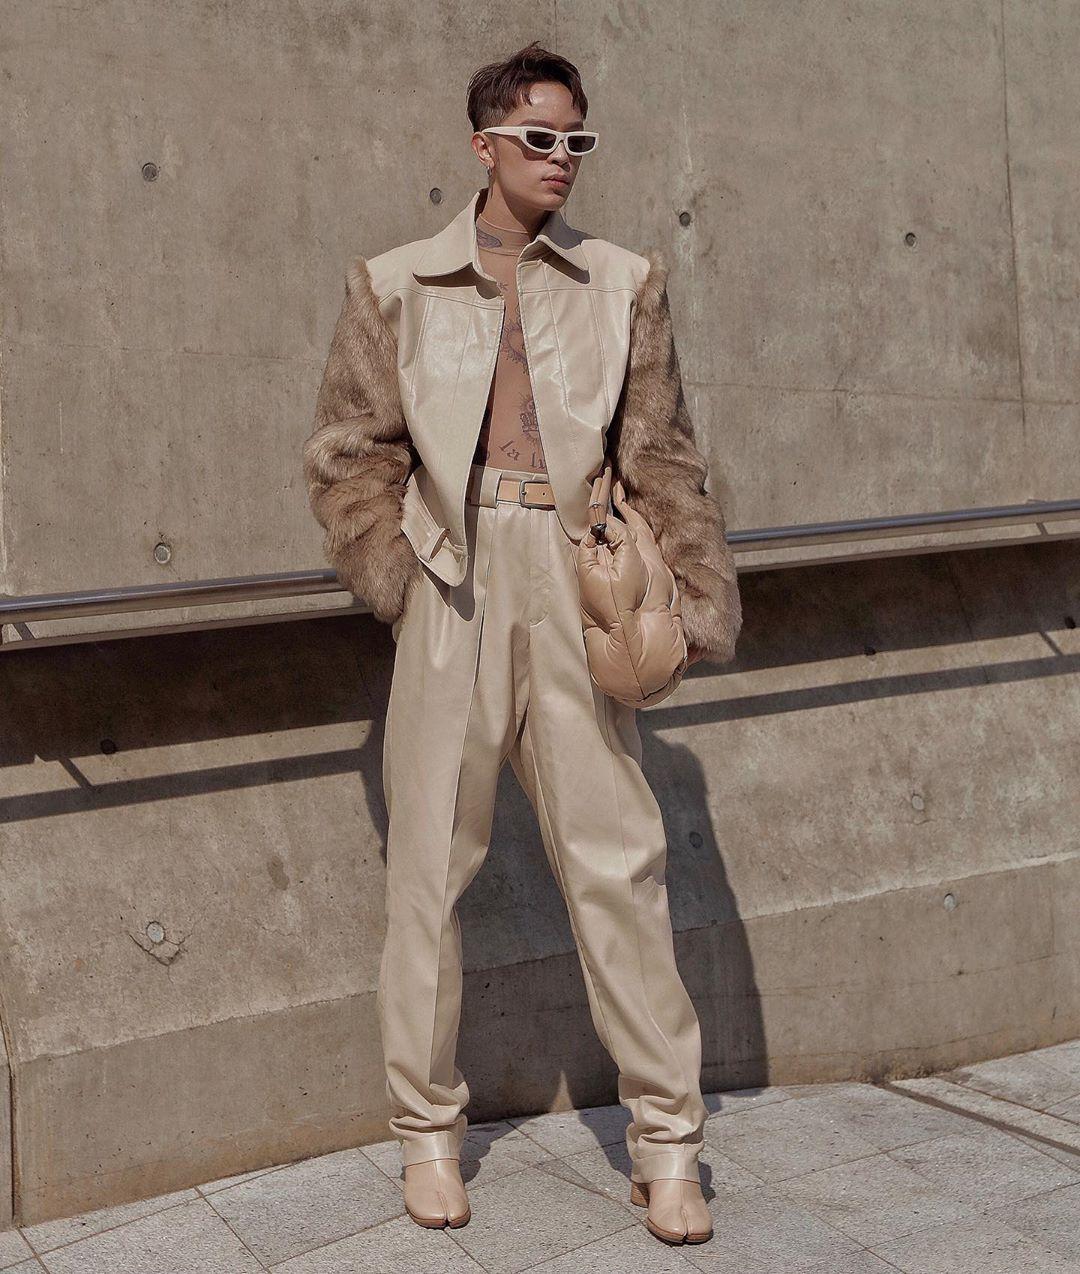 fashionista Kelbin Lei - sao nam mặc đẹp tuần 3 tháng 10